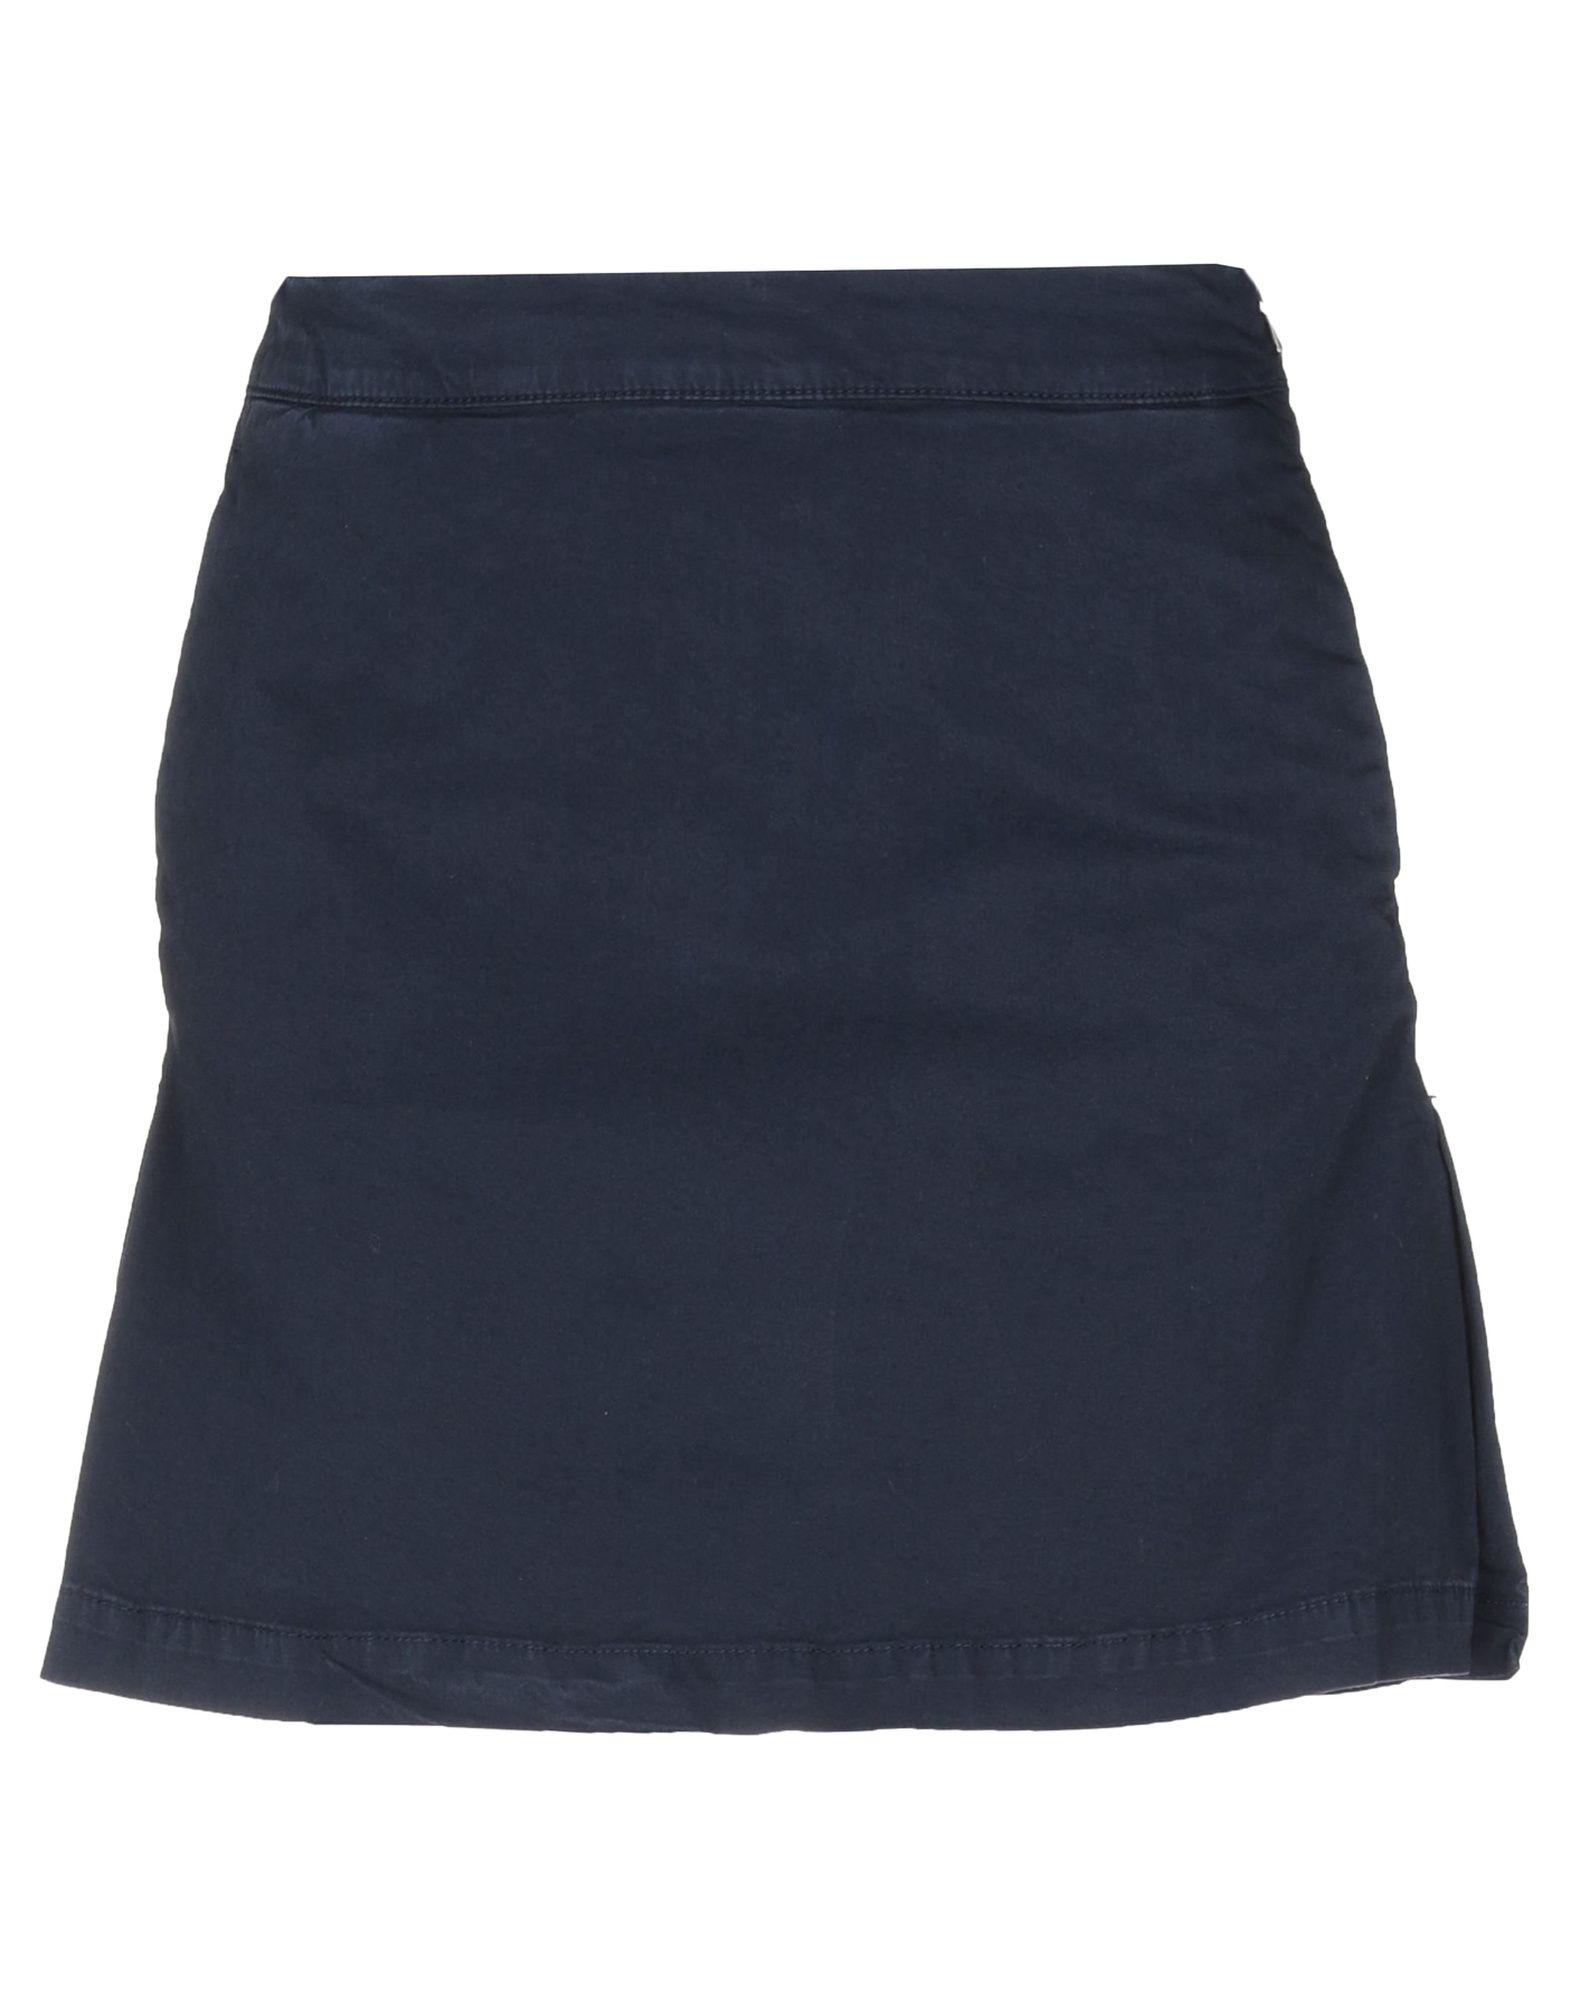 NORTH SAILS Мини-юбка iro мини юбка